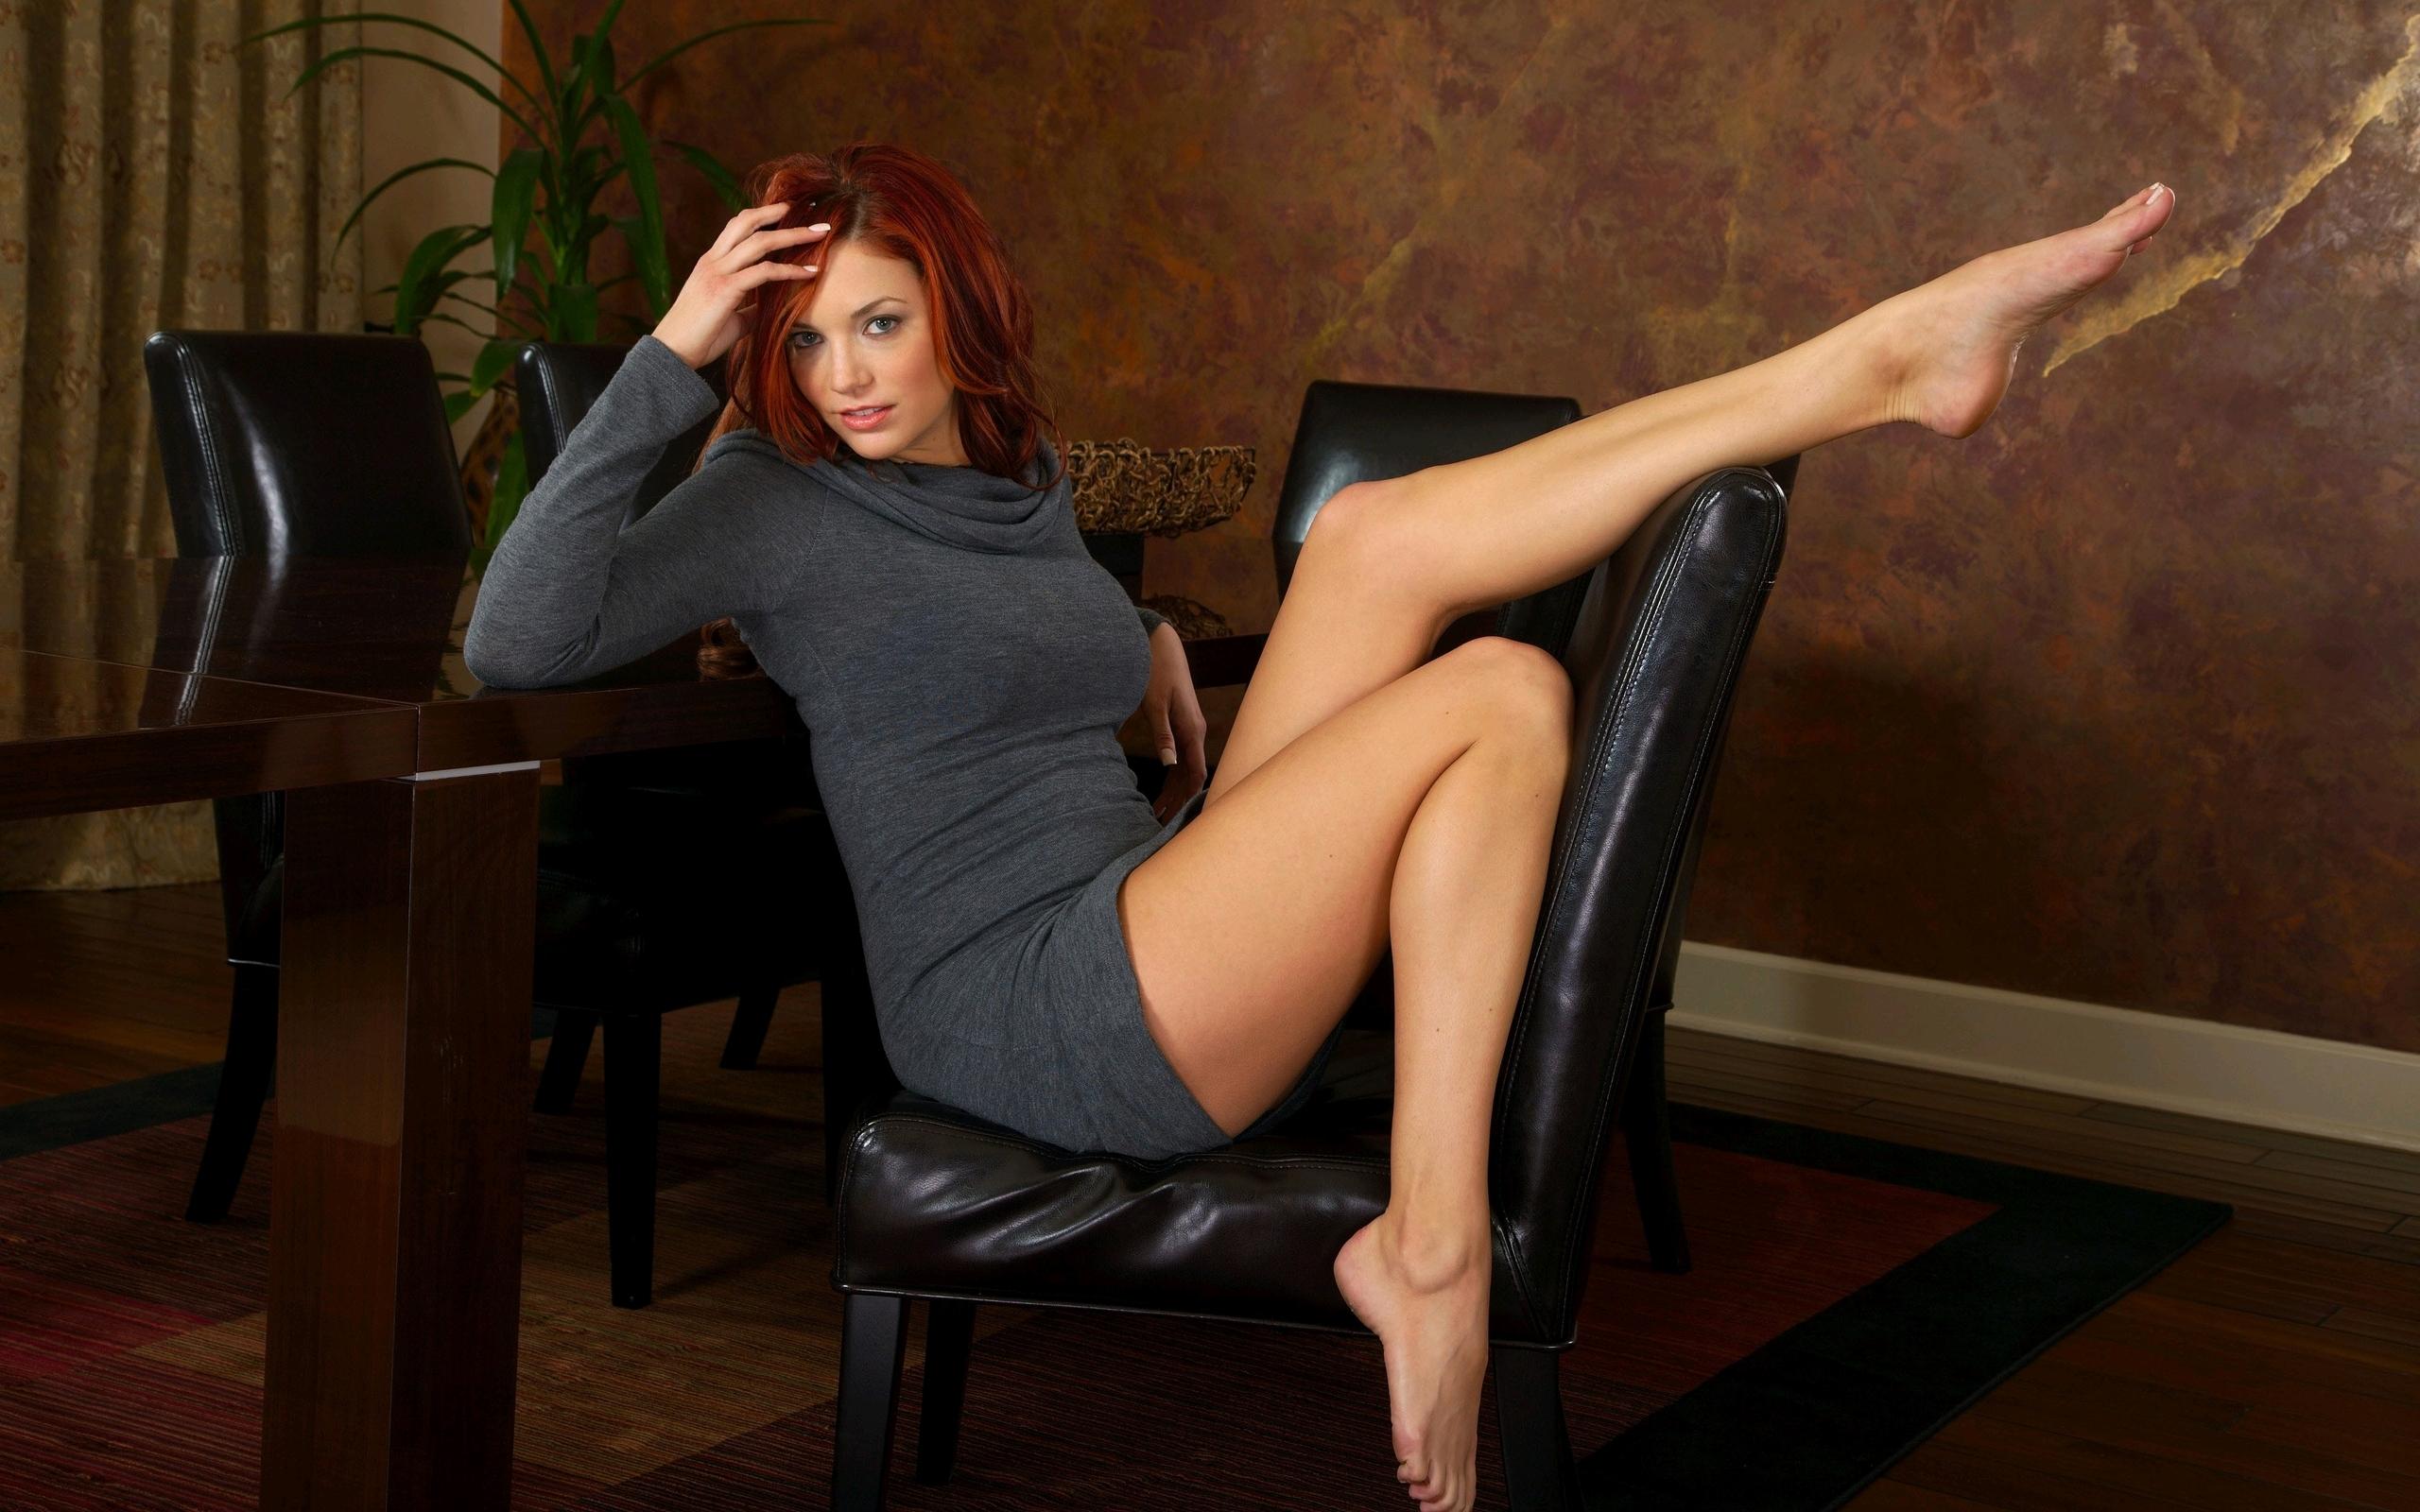 Sexy legs movies lesbian